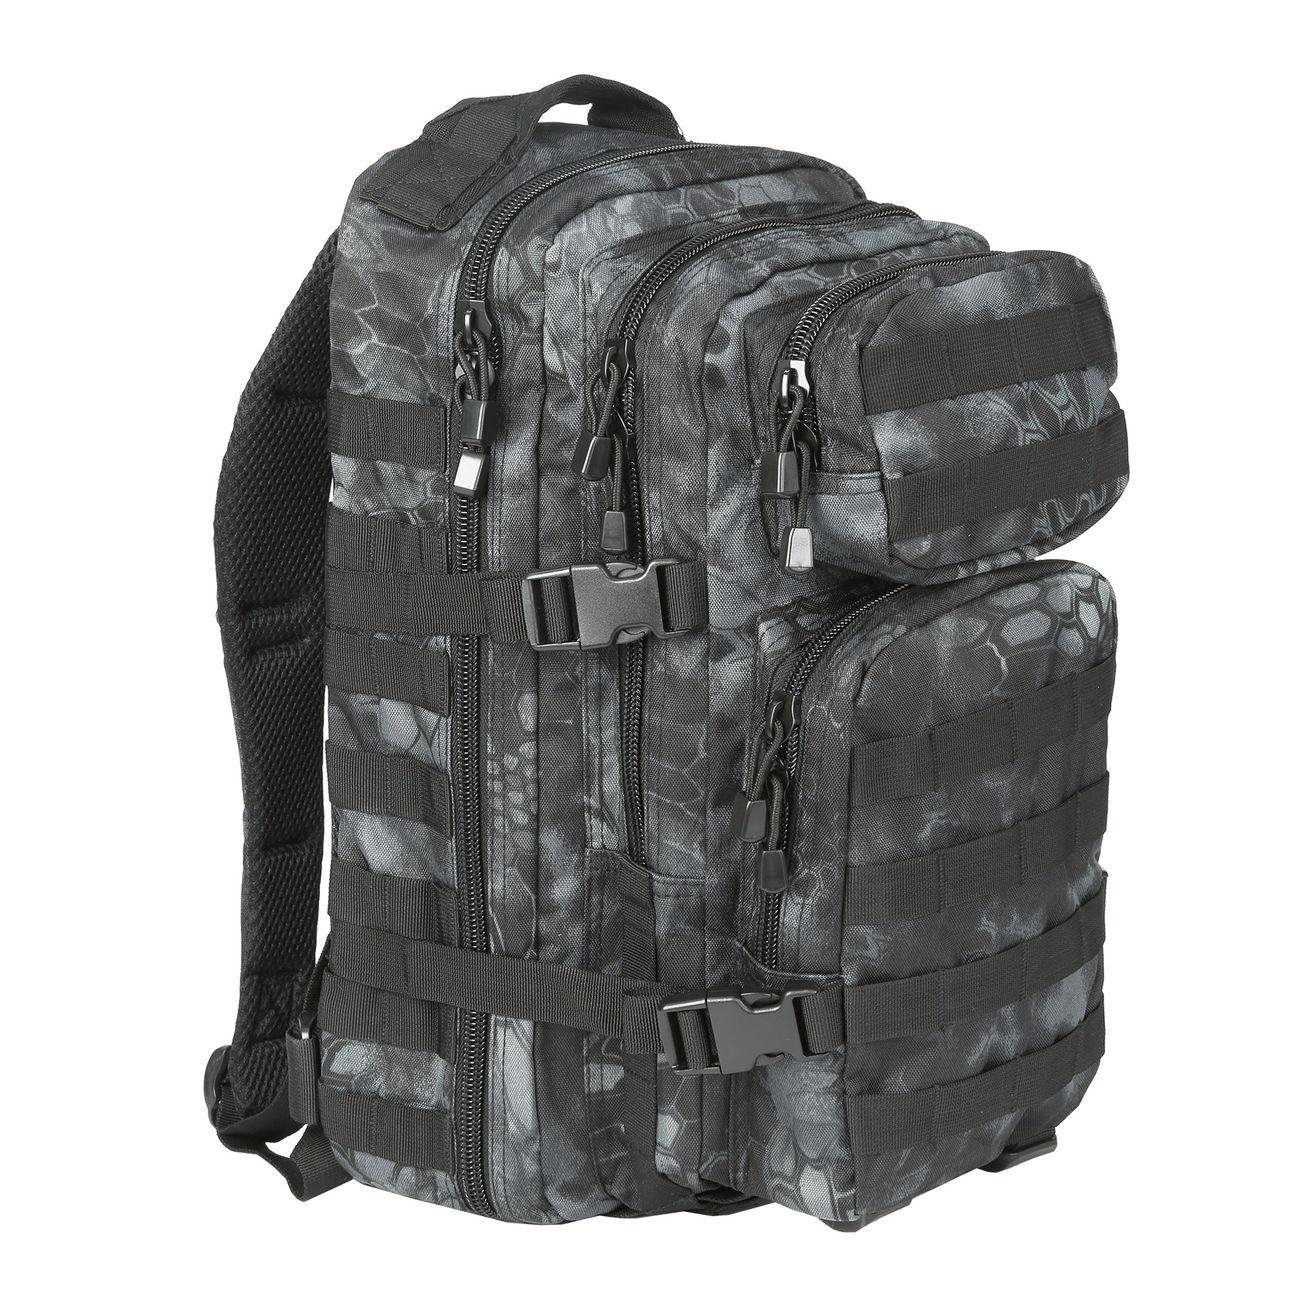 7fe390aa769ff Mil-Tec Rucksack US Assault Pack I 20 Liter mandra night günstig ...